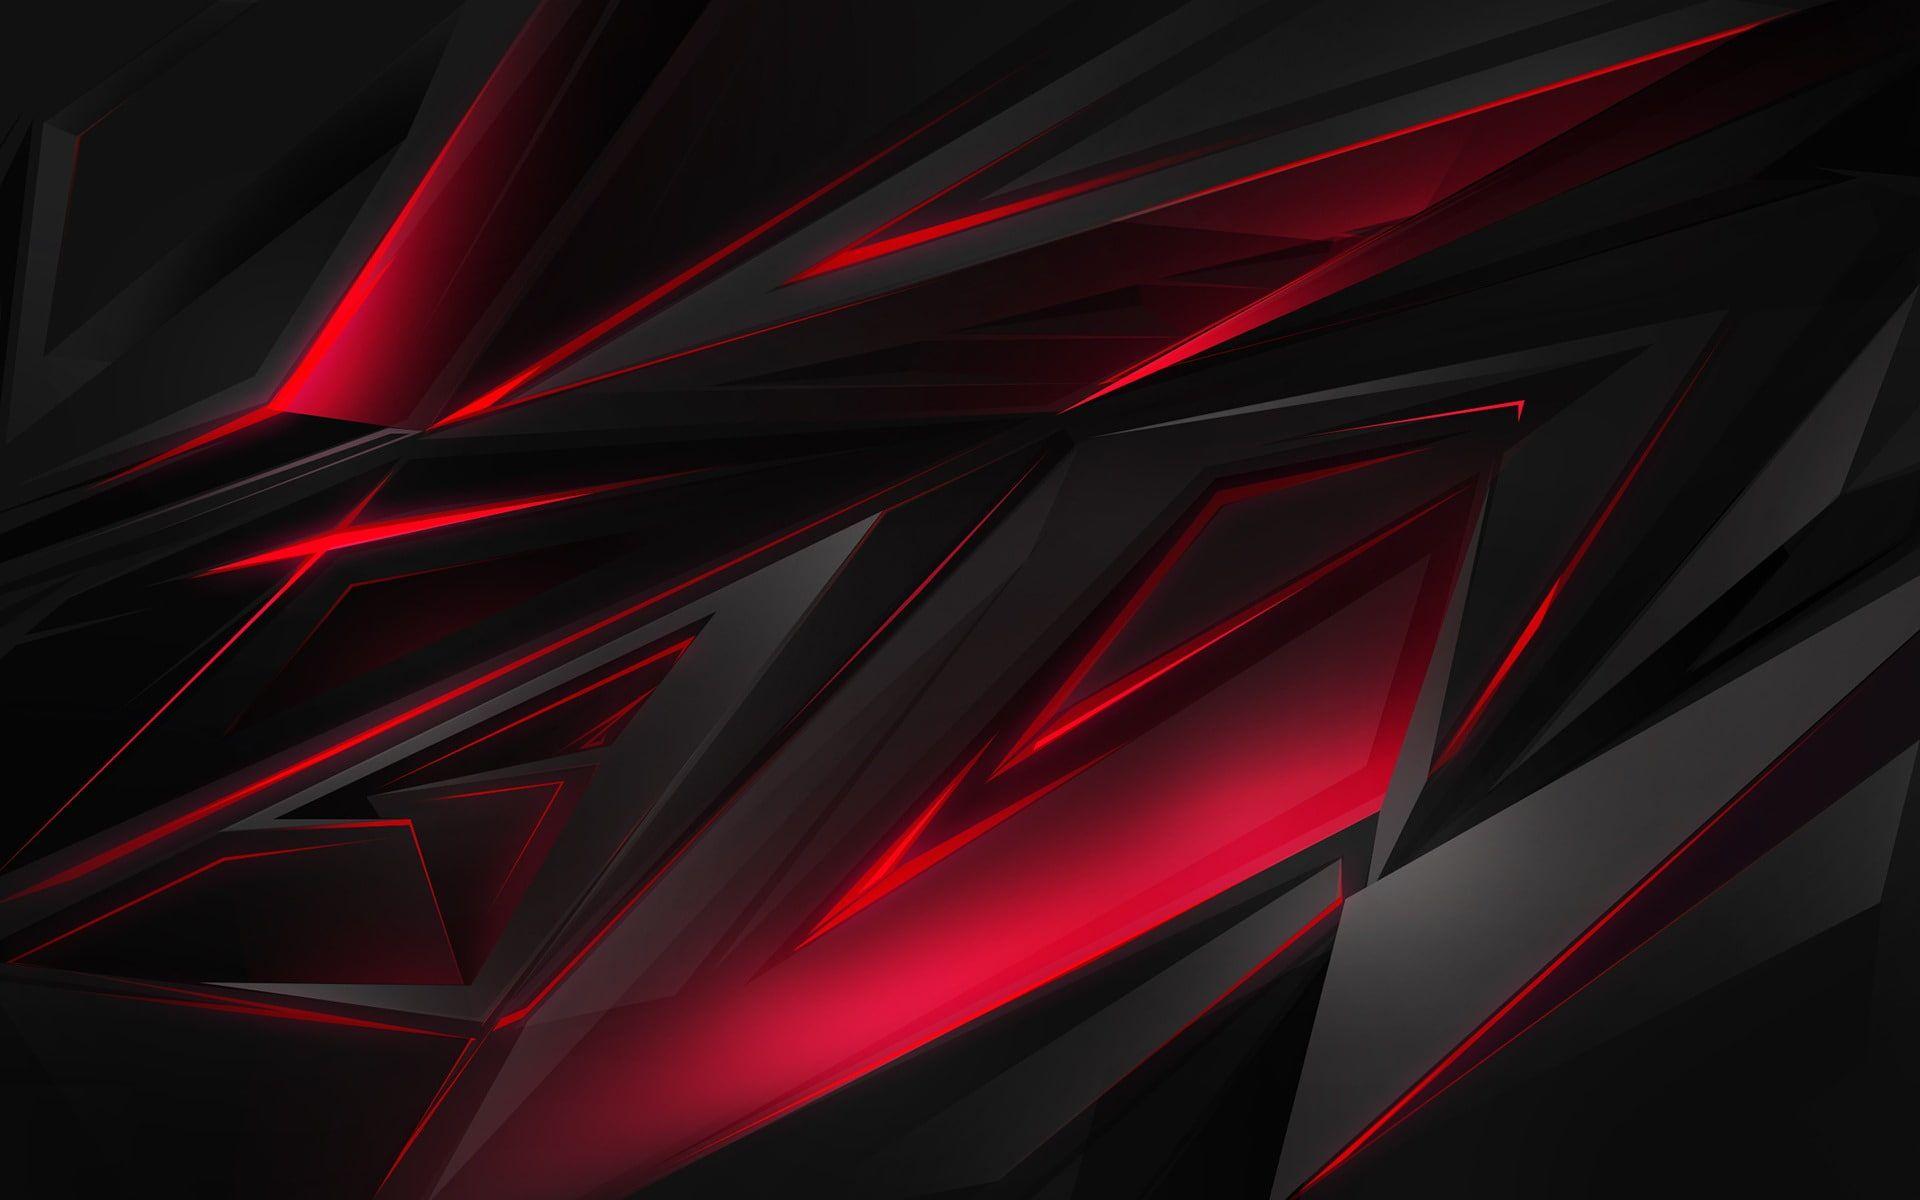 Abstract Polygonal Red Glare Dark Background 1080p Wallpaper Hdwallpaper Desktop Red And Black Wallpaper Black Wallpaper Dark Red Wallpaper